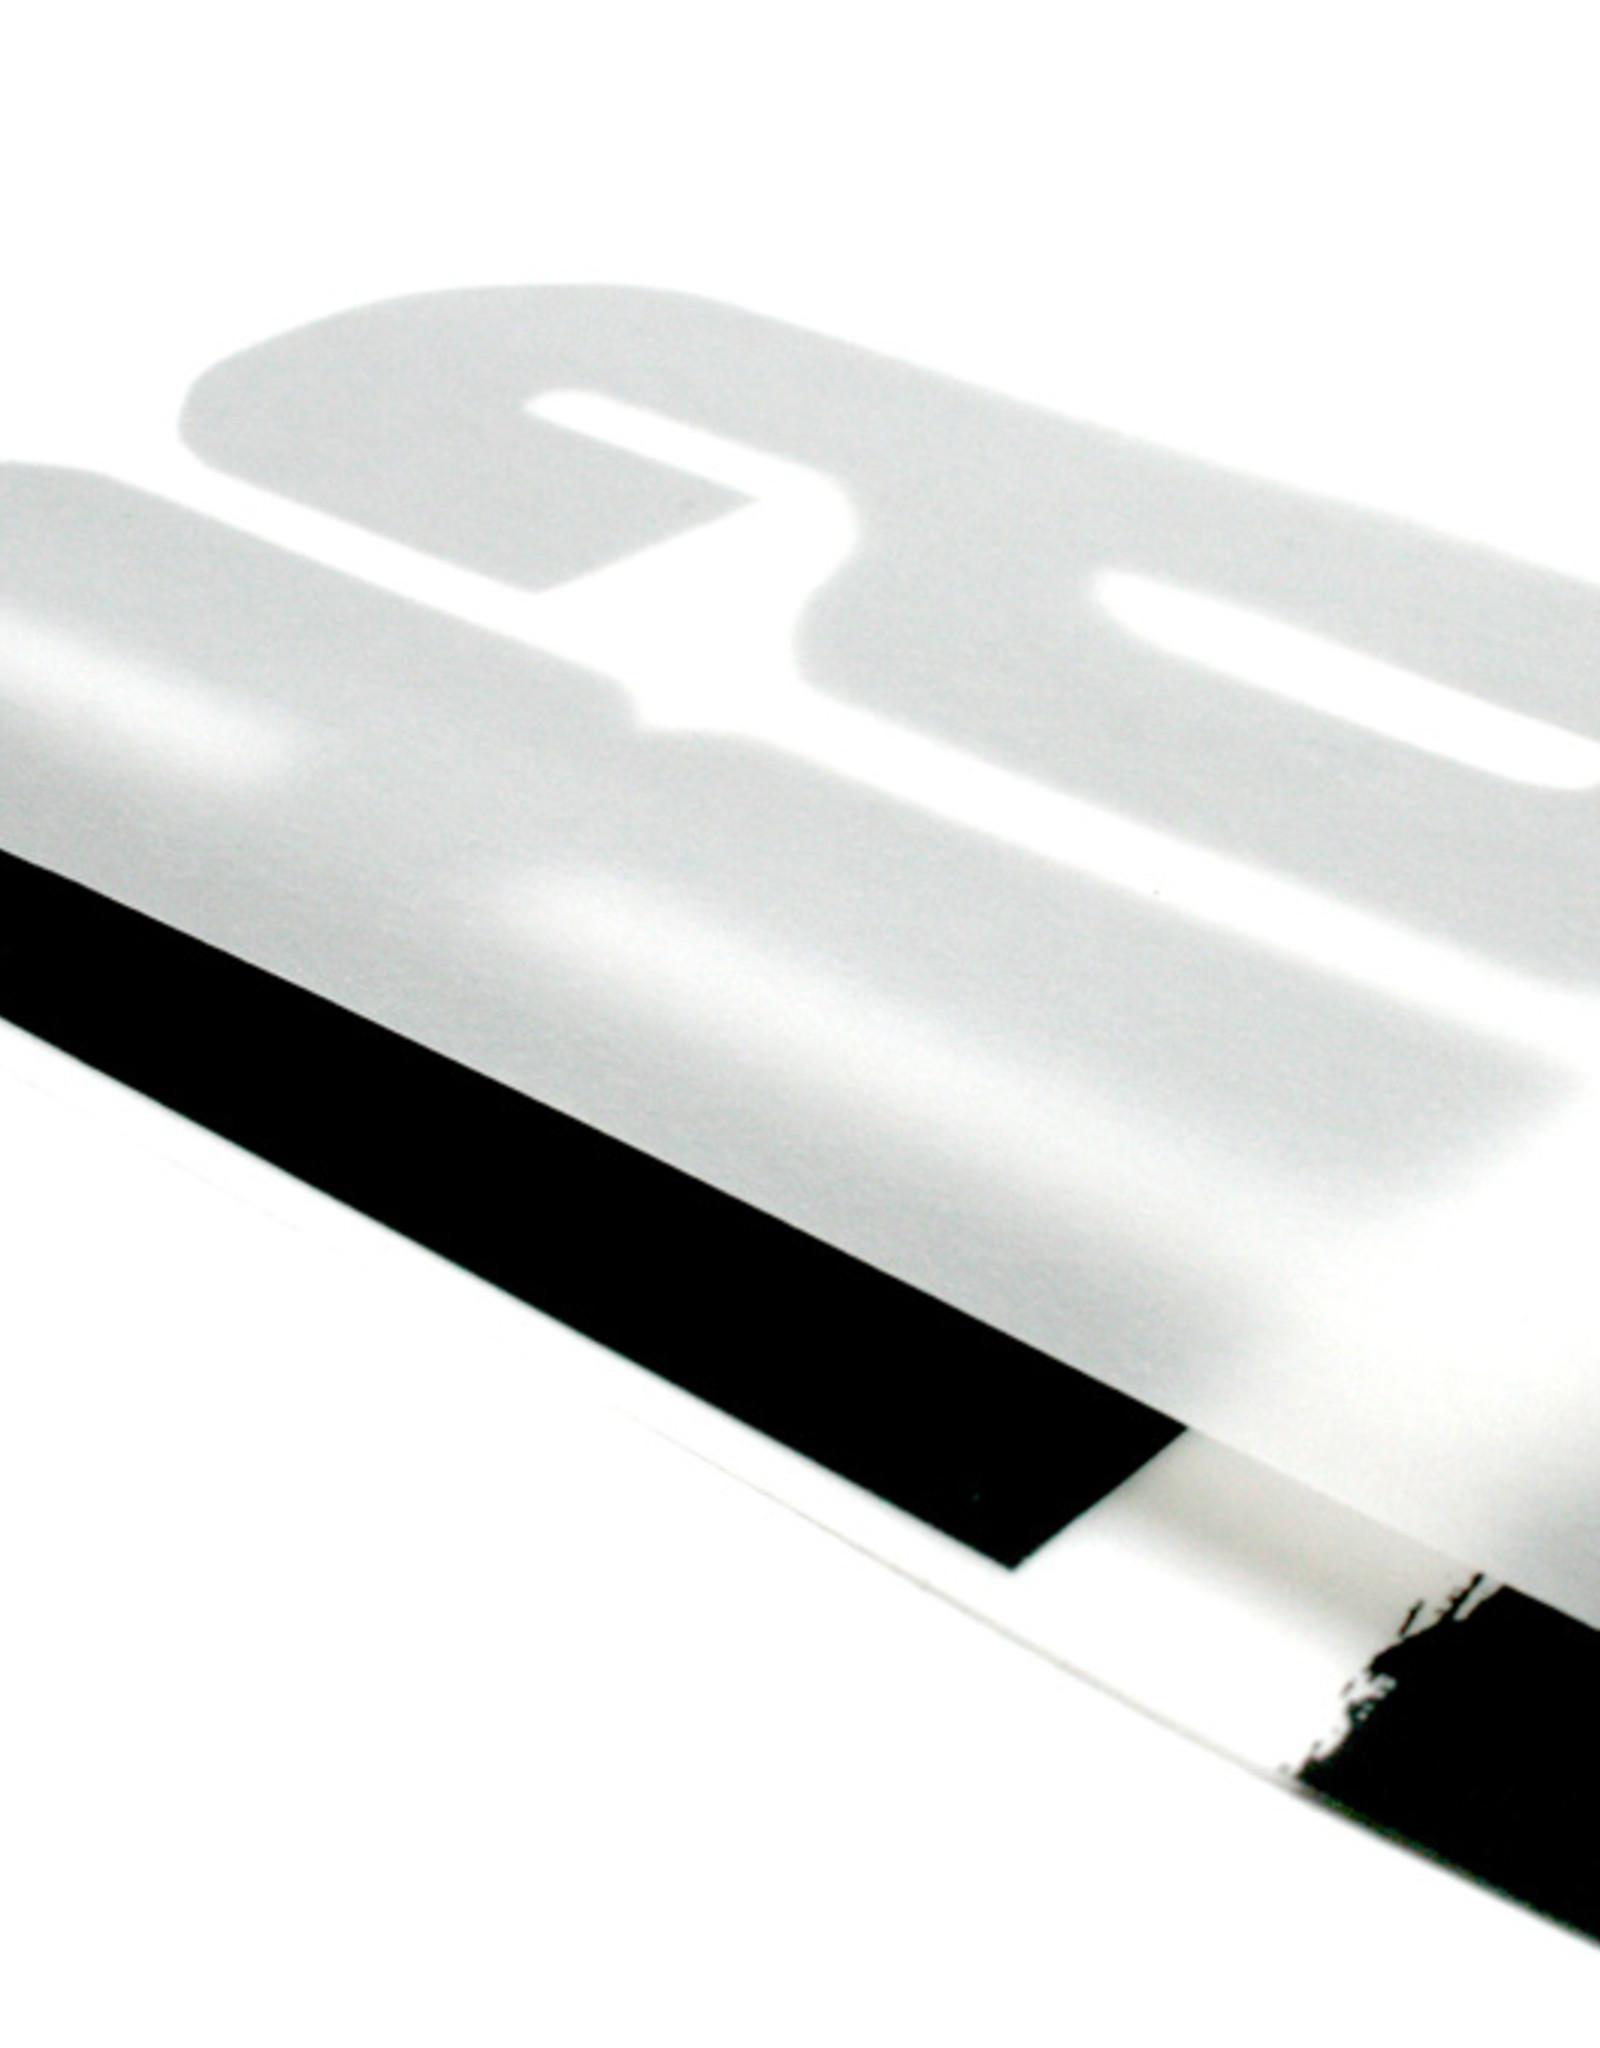 Canson 500 vel kalkpapier A3 50 grams